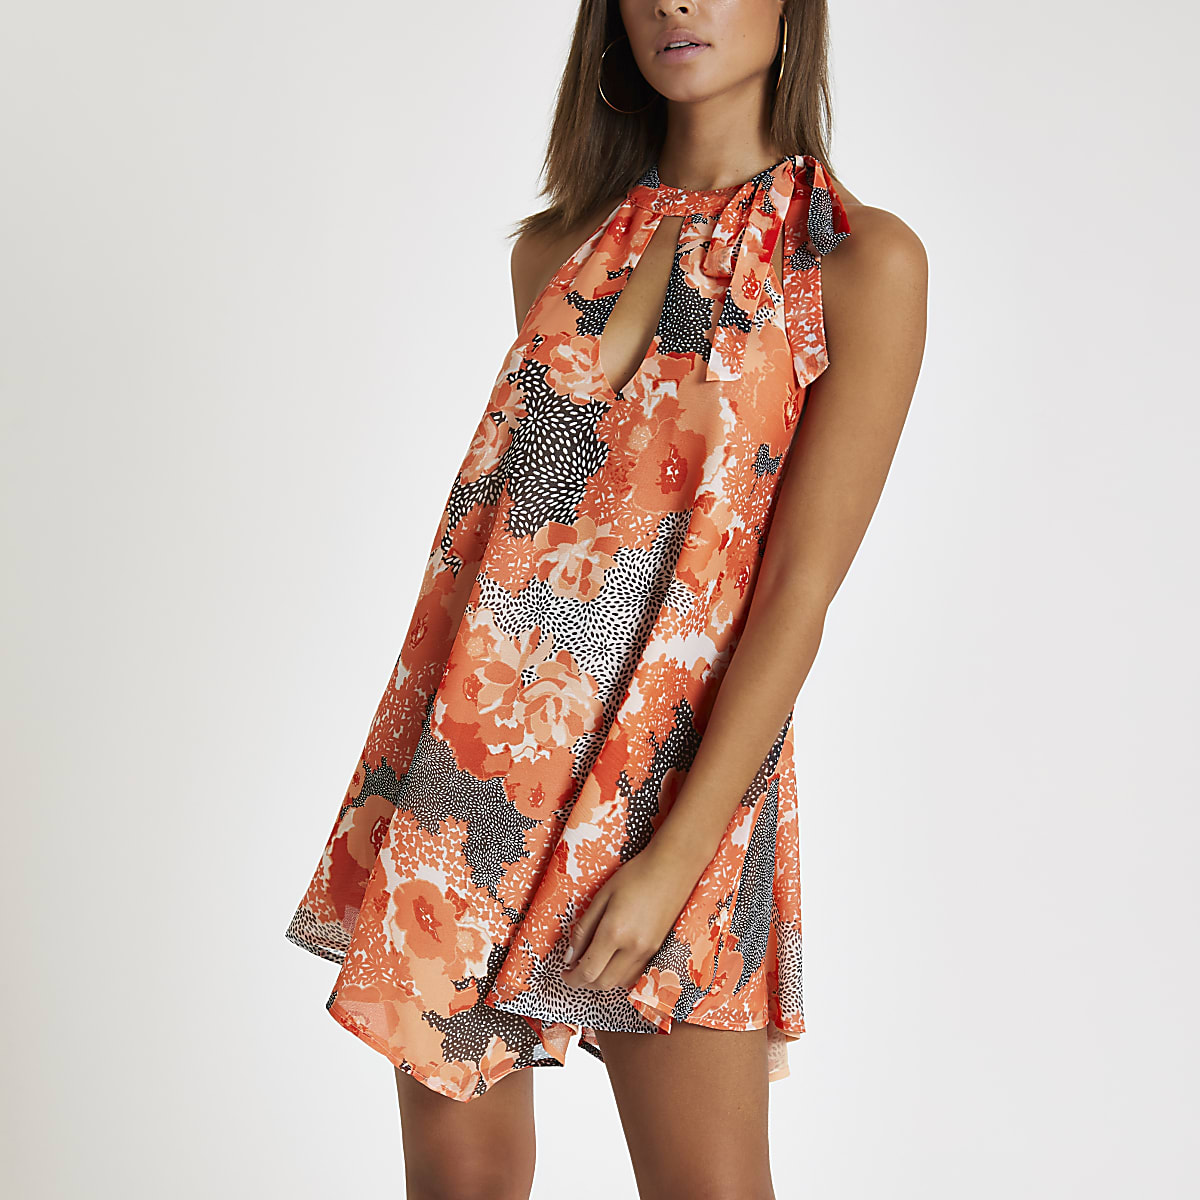 Coral floral halter neck beach dress